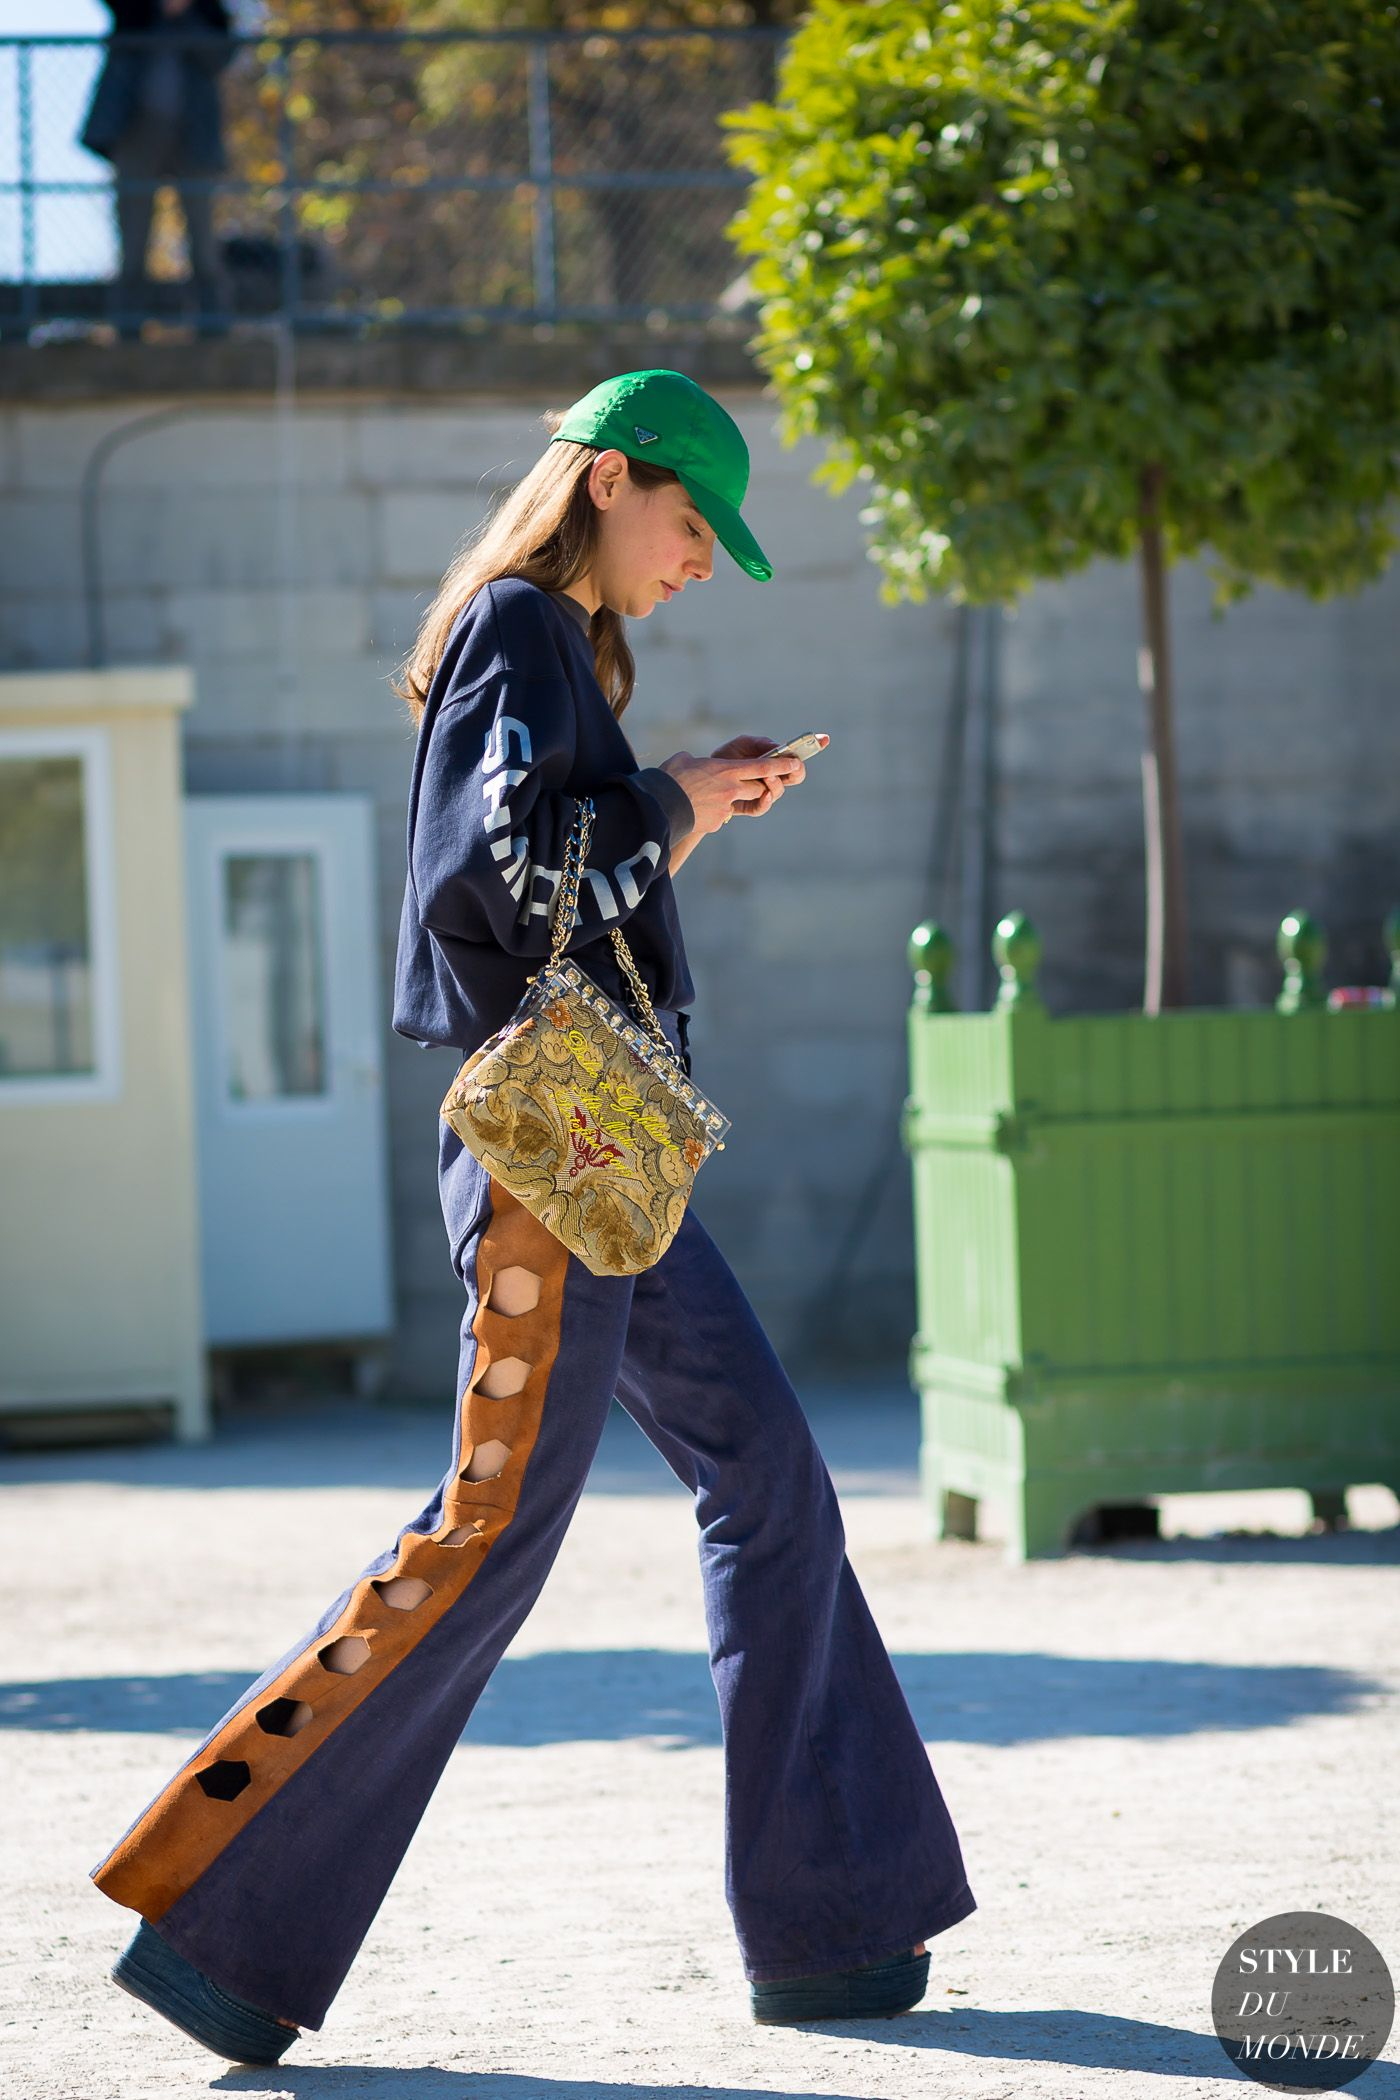 Paris Fashion Week SS 2016 Street Style: Ursina Gysi